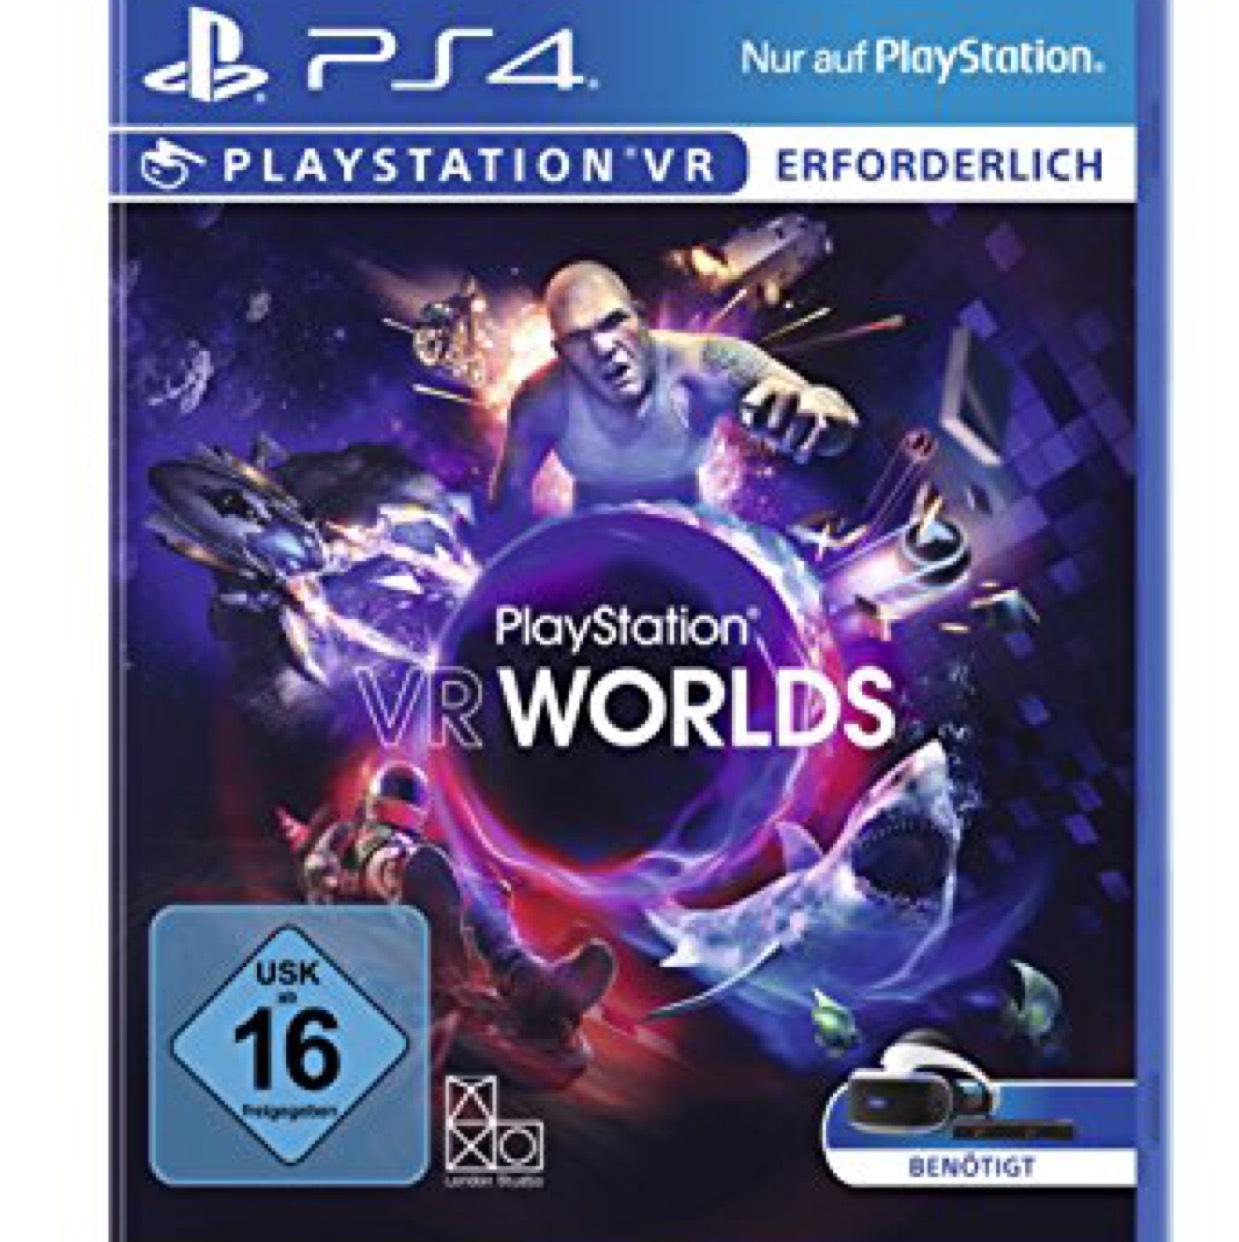 PSVR Worlds (PS4 VR)